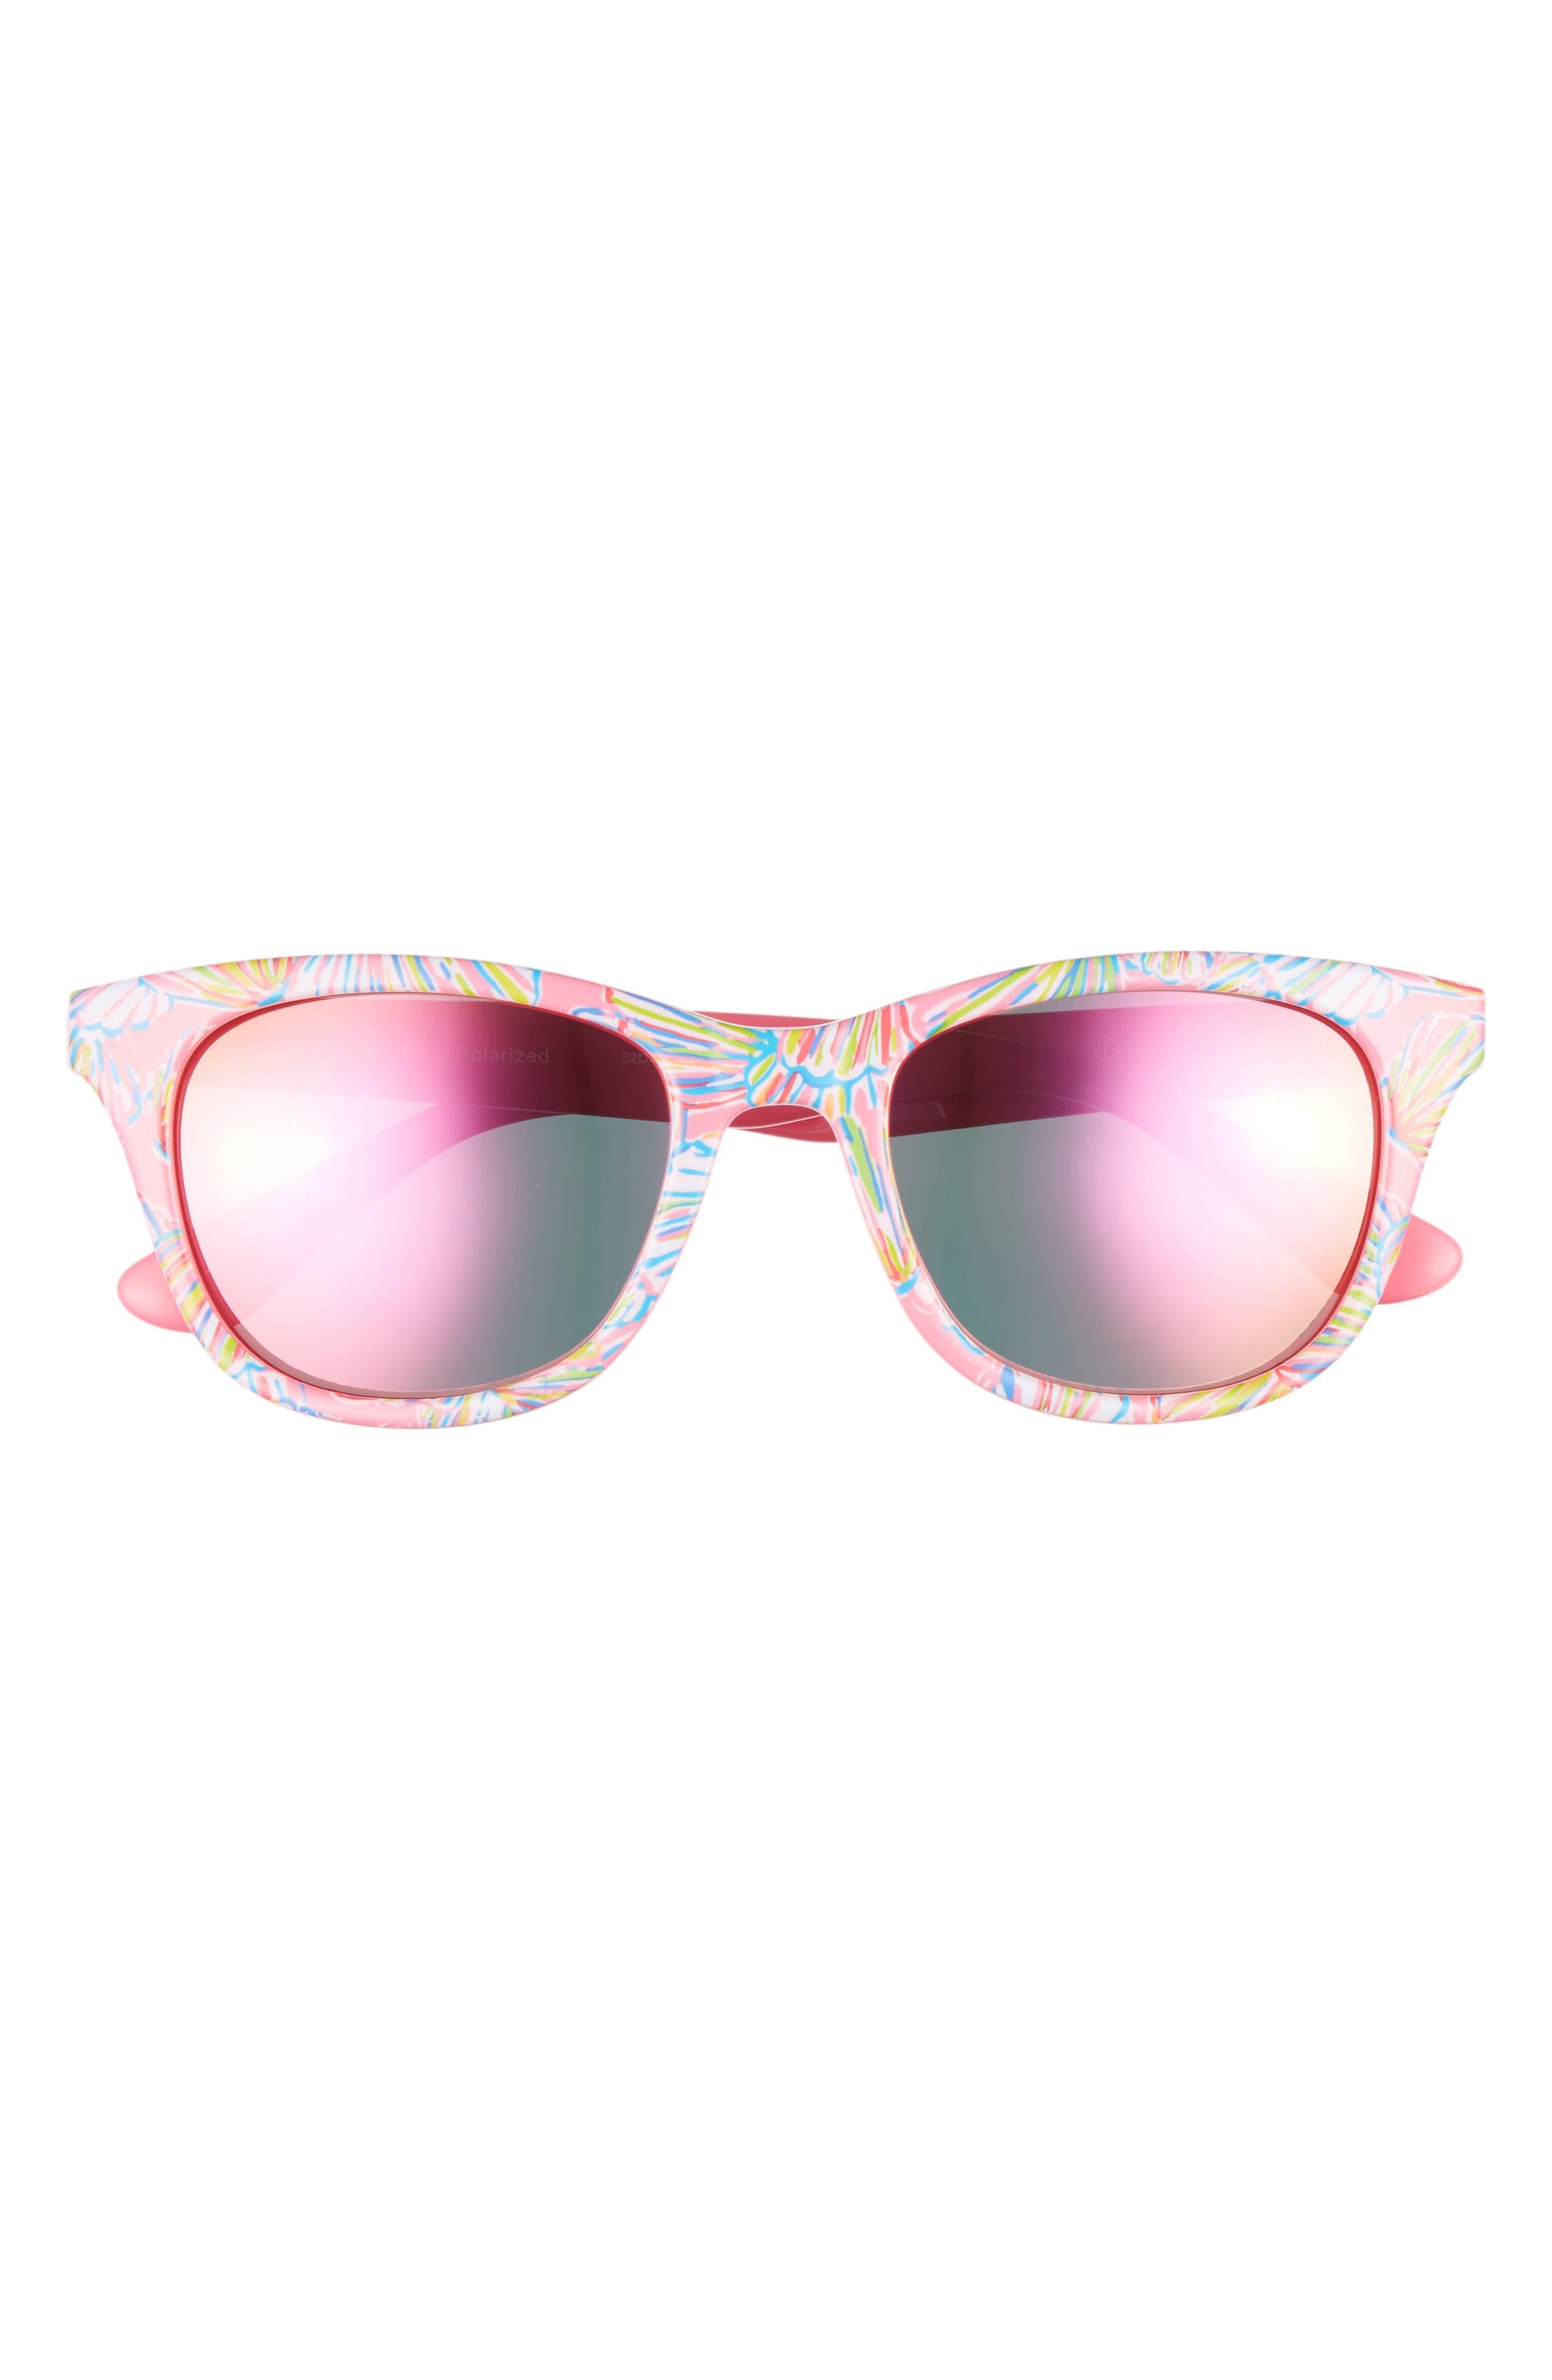 Lilly Pulitzer® Maddie 52mm Polarized Mirrored Sunglasses